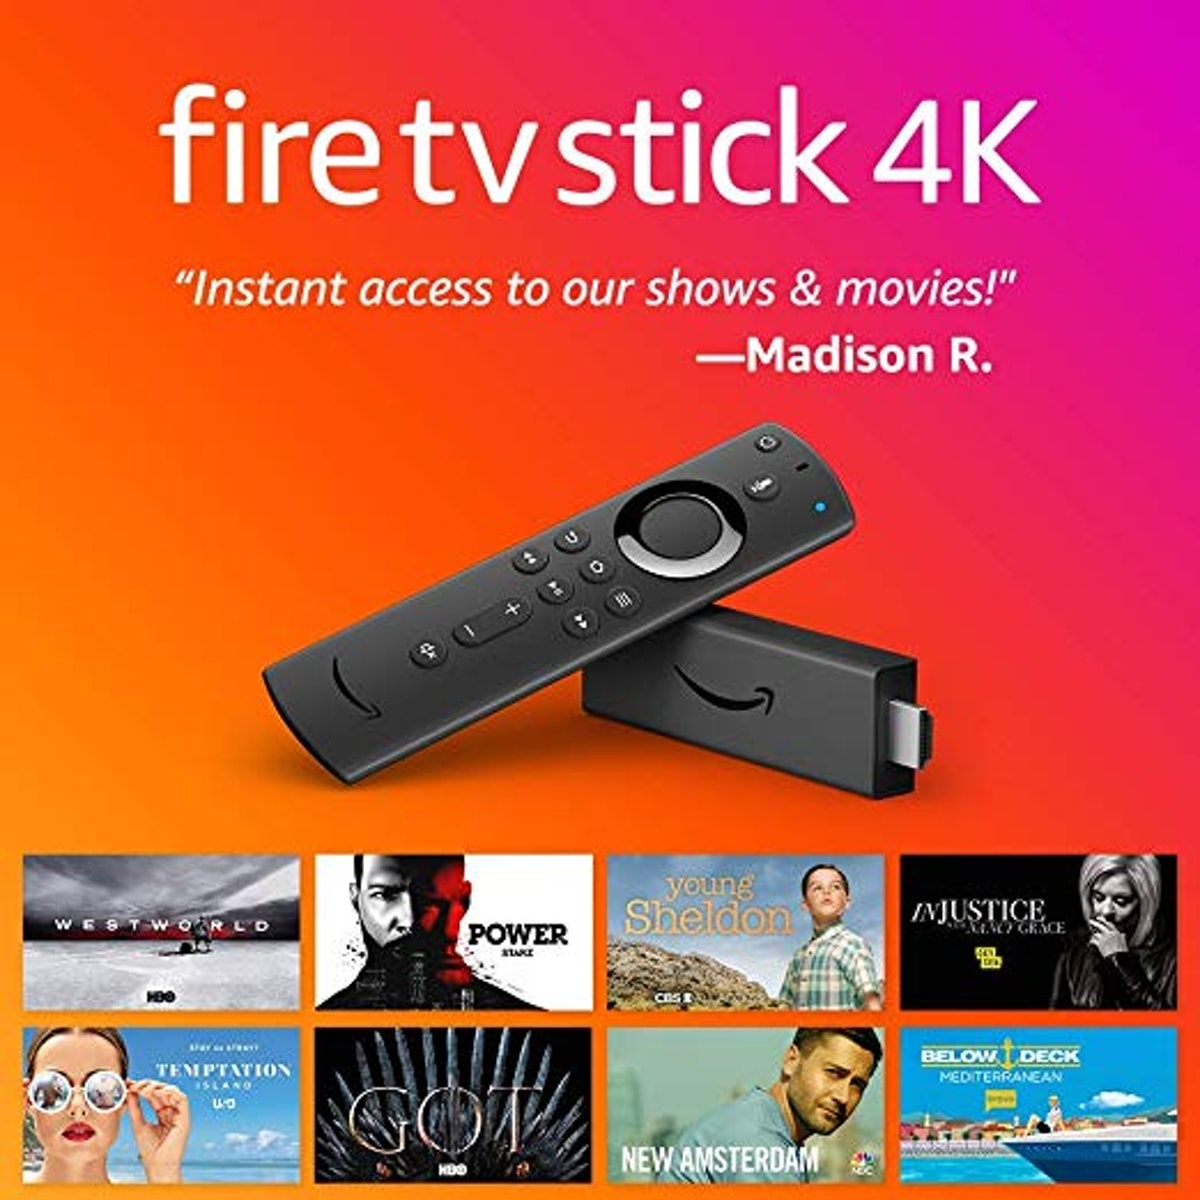 Amazon Fire TV streaming stick